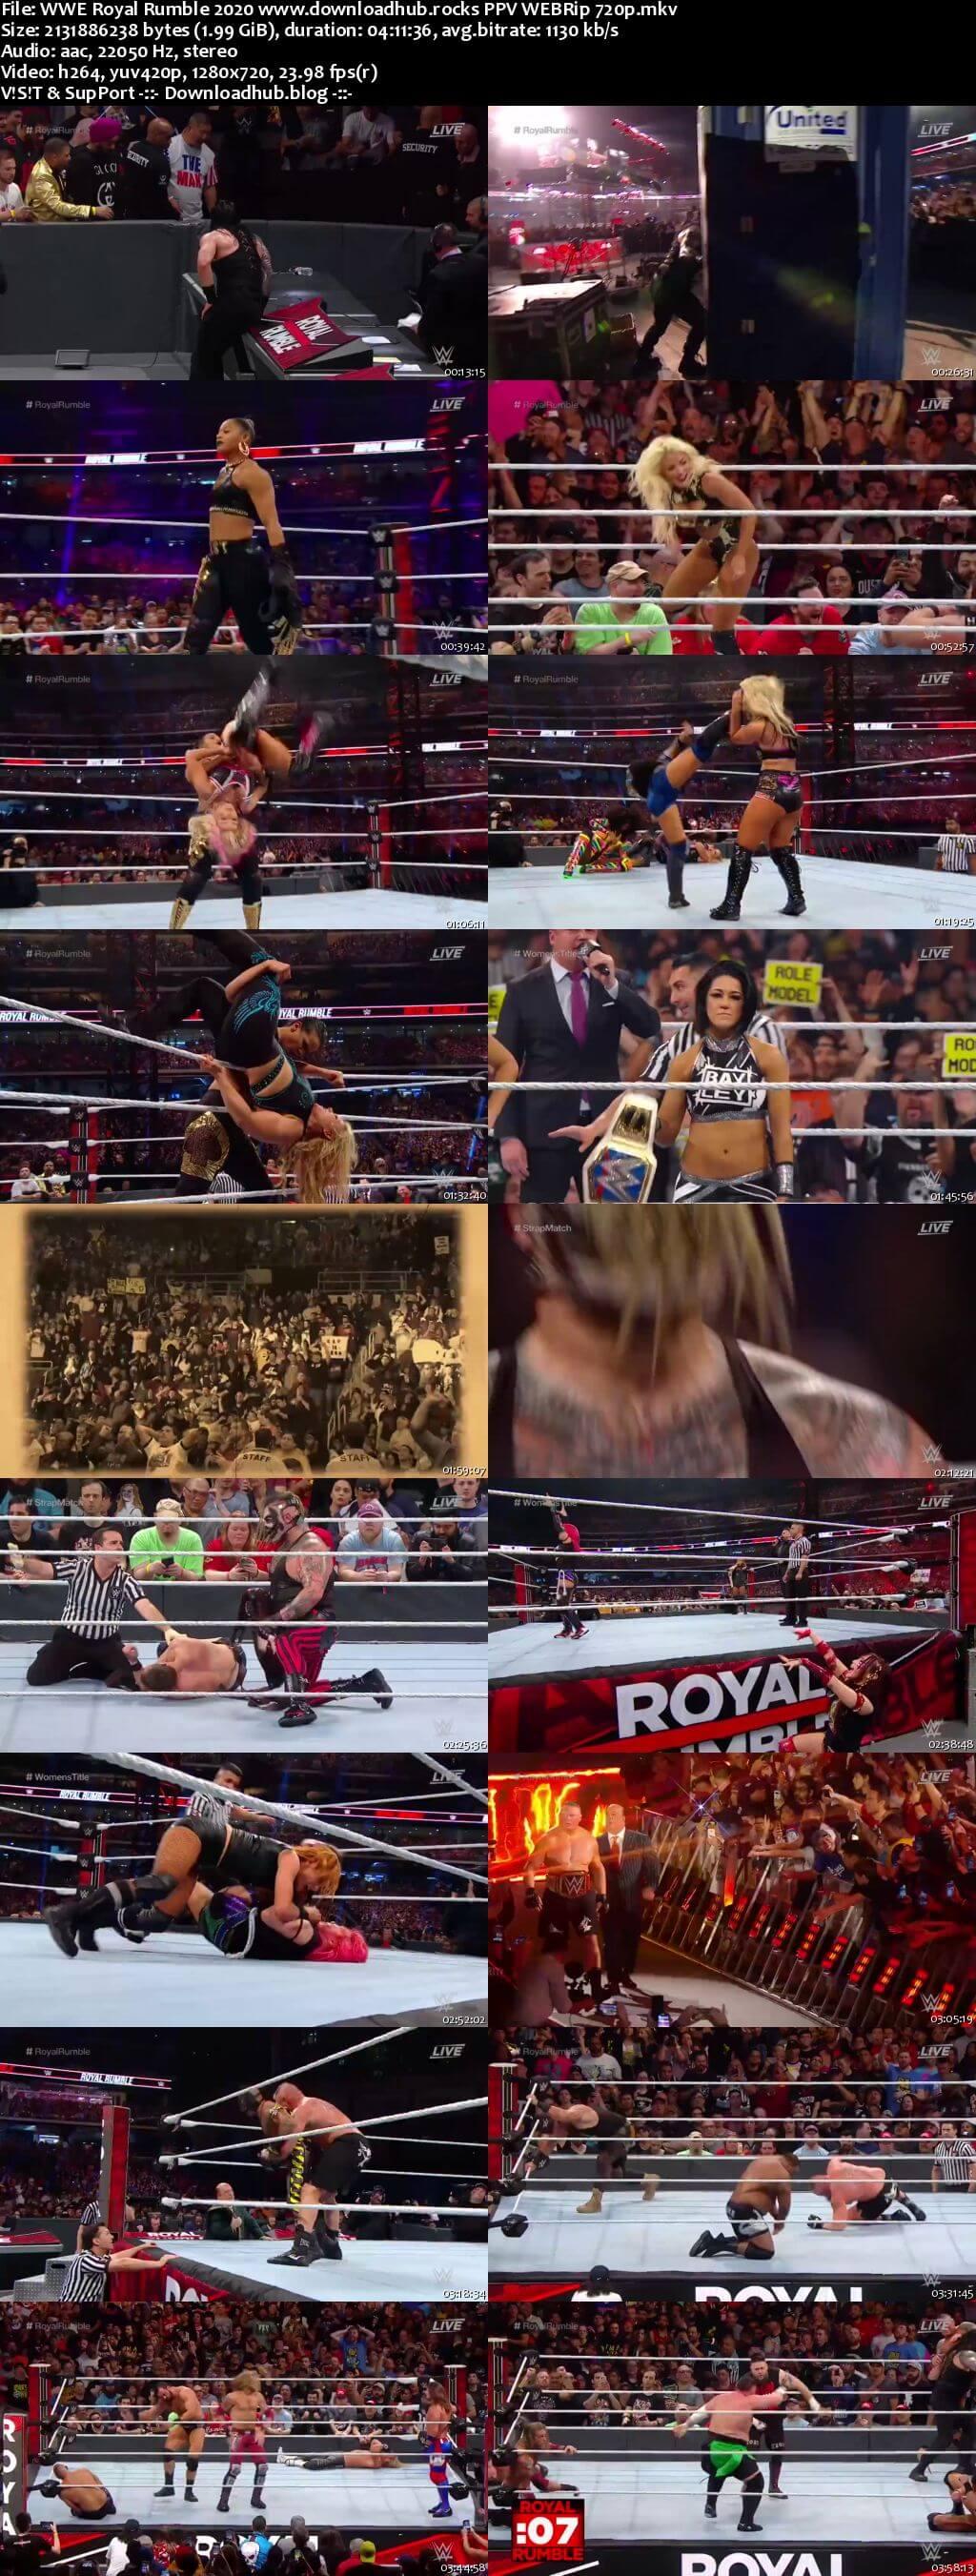 WWE Royal Rumble 26th January 2020 720p 999MB PPV WEBRip 480p